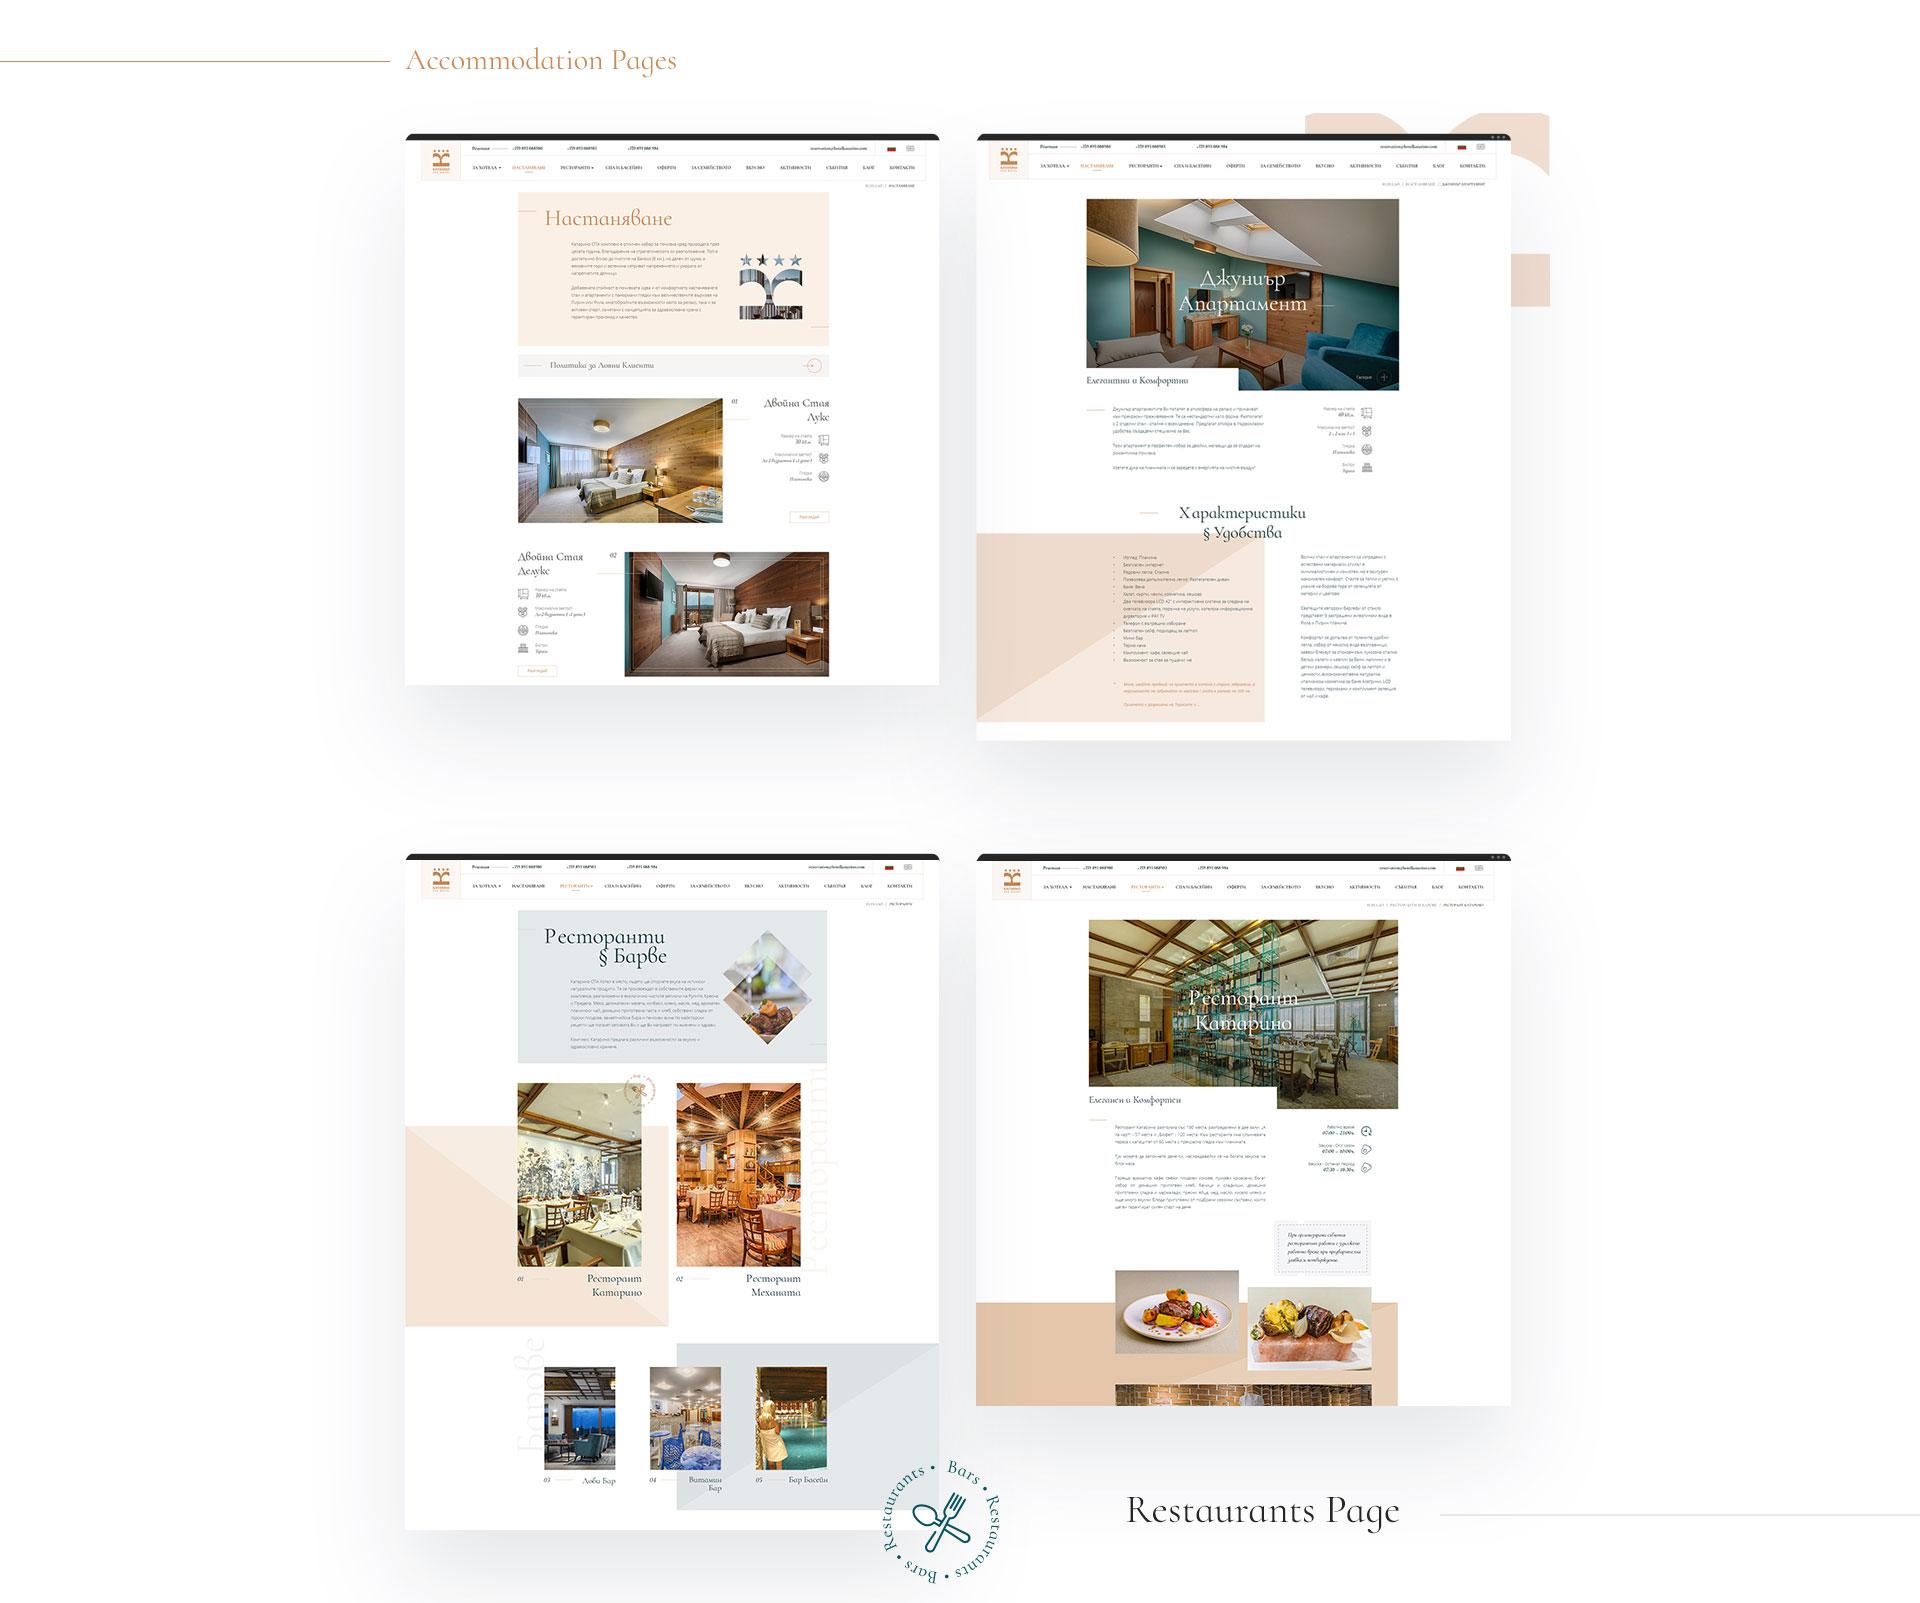 hotel katarino accomodation